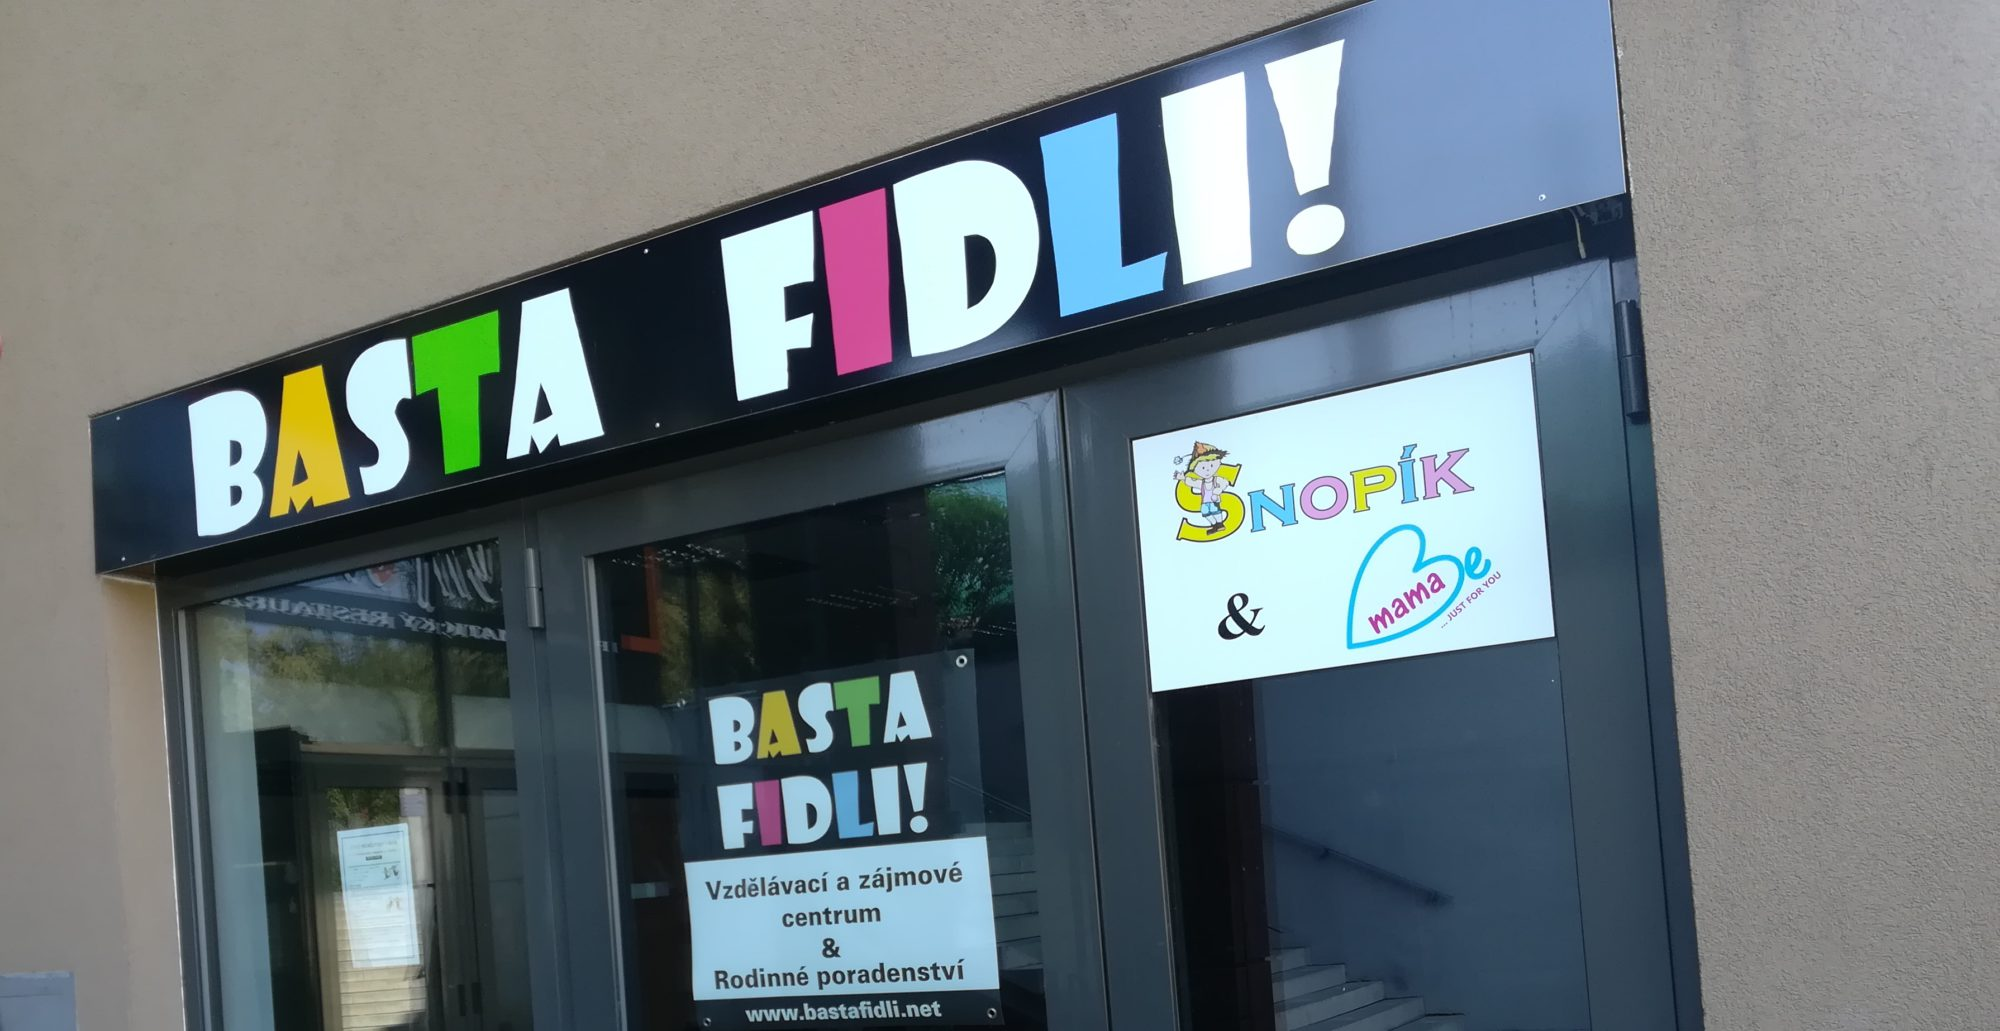 www.bastafidli.net